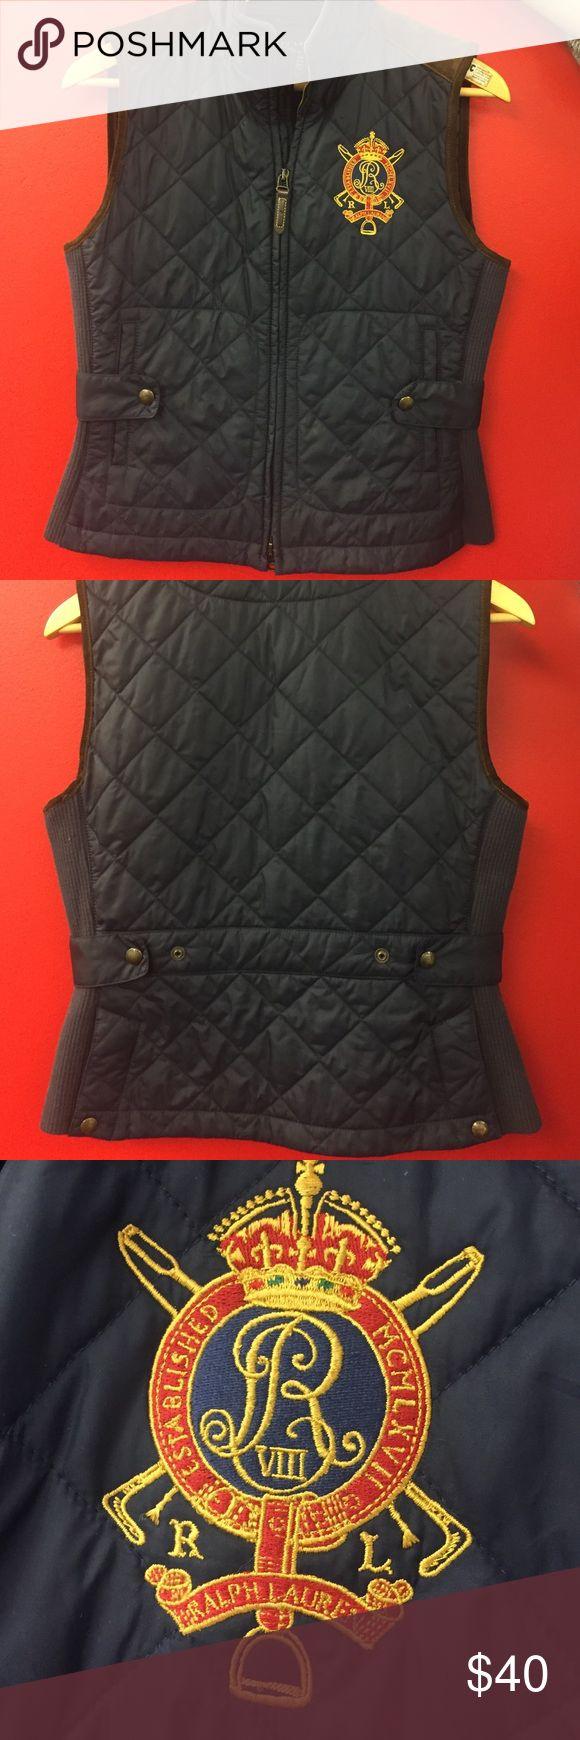 Ralph Lauren vest with suede detail Ralph Lauren navy blue vest with side detail never worn! Medium runs small Ralph Lauren Jackets & Coats